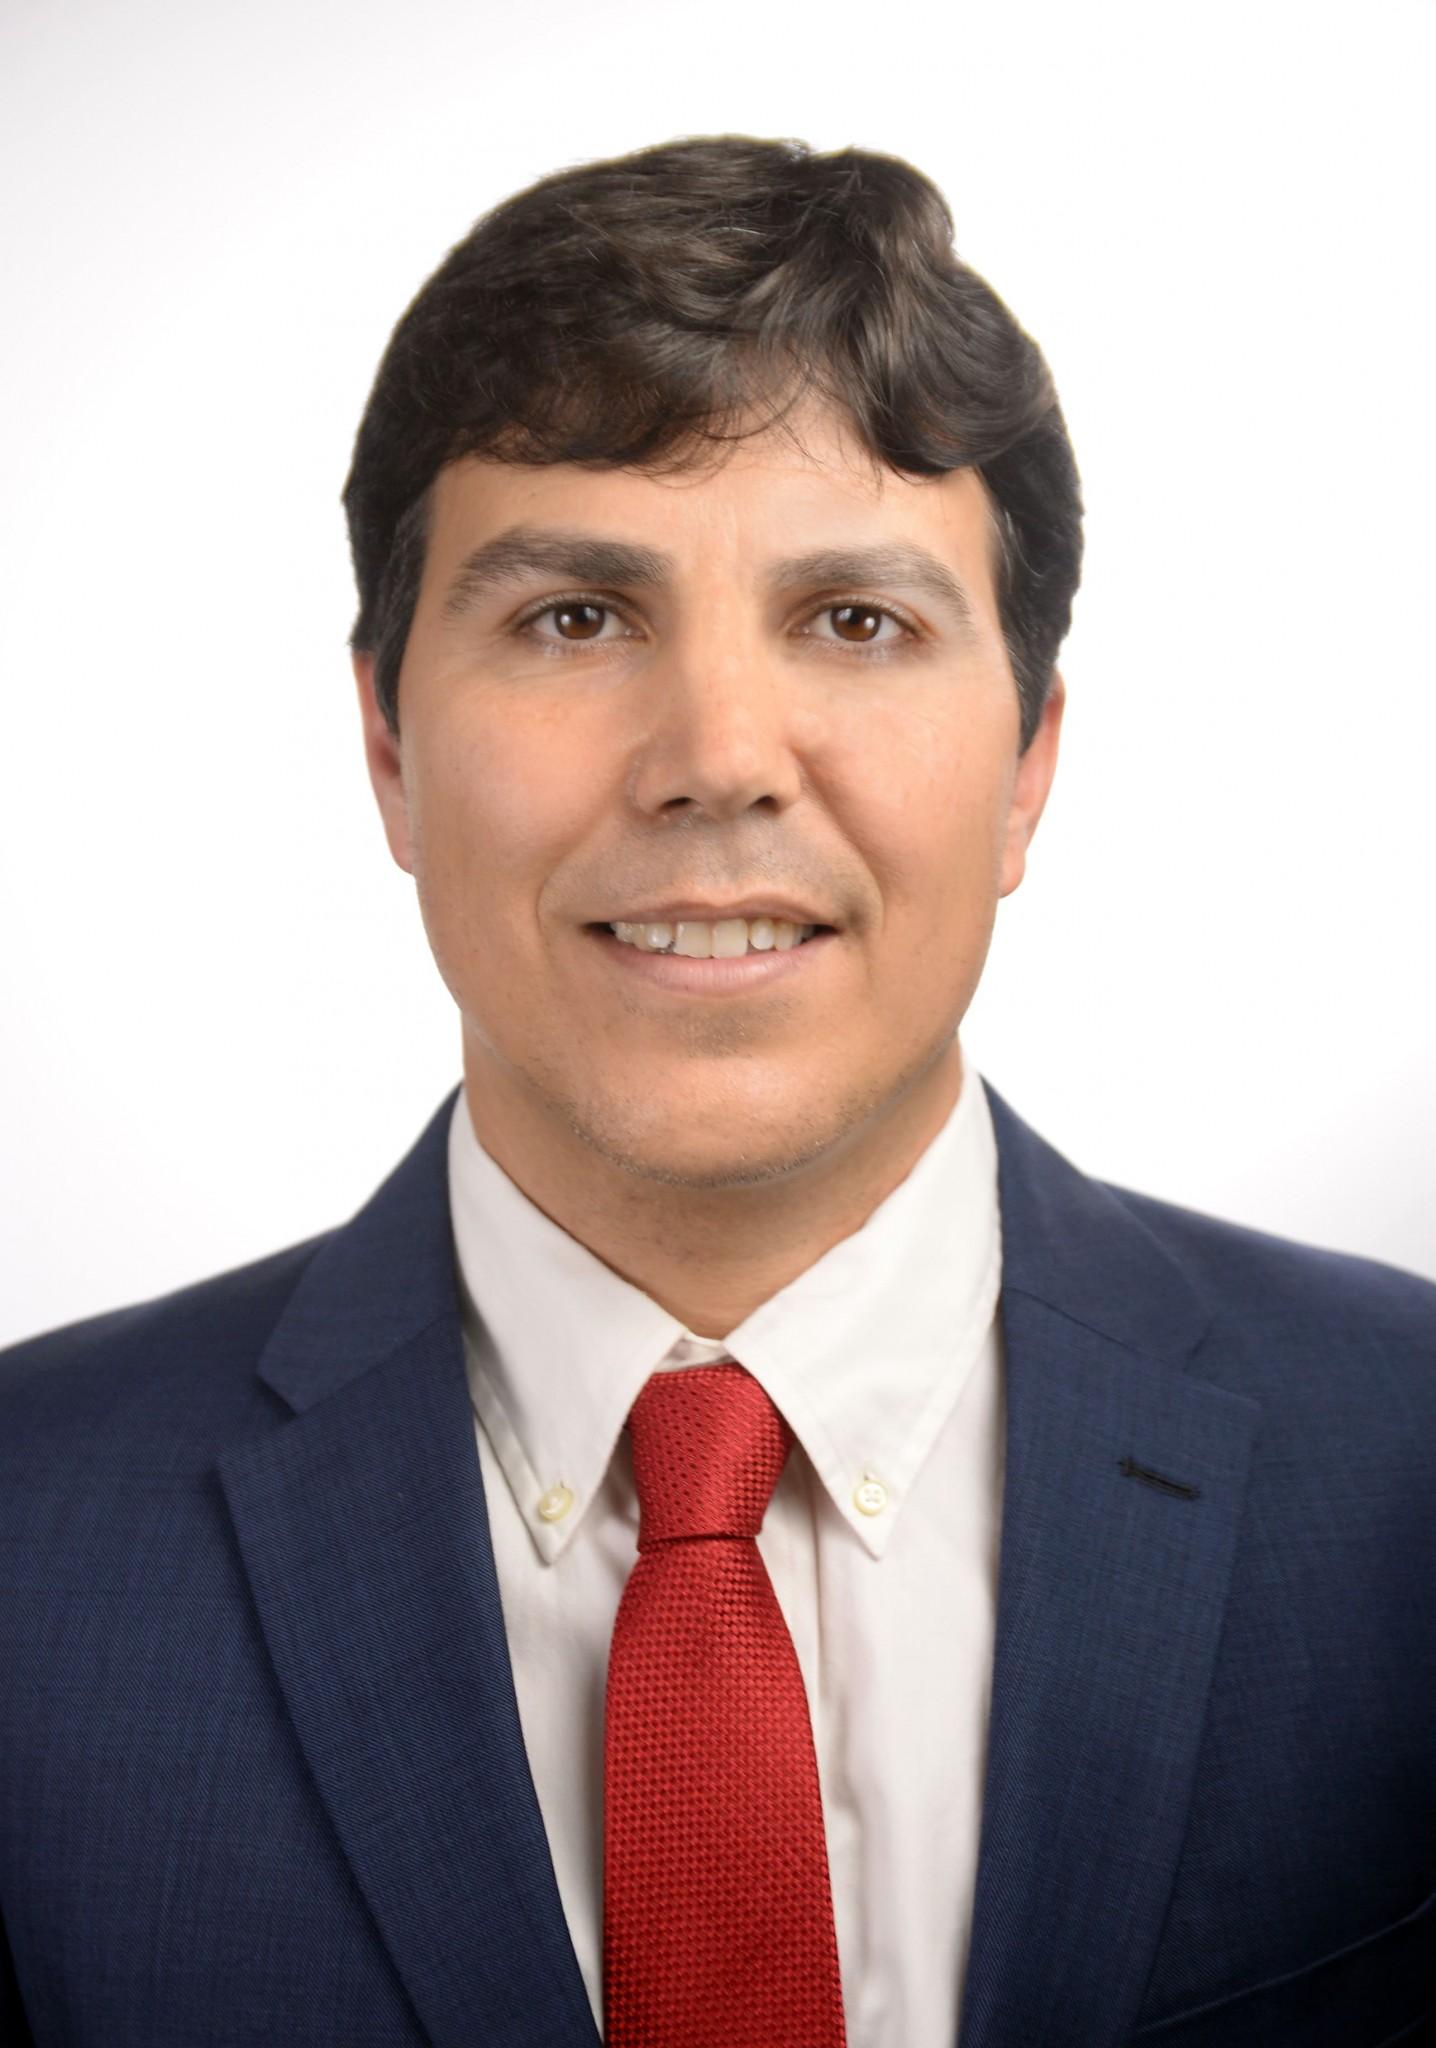 Alon Dayan, Celliboost CEO. Photo courtesy